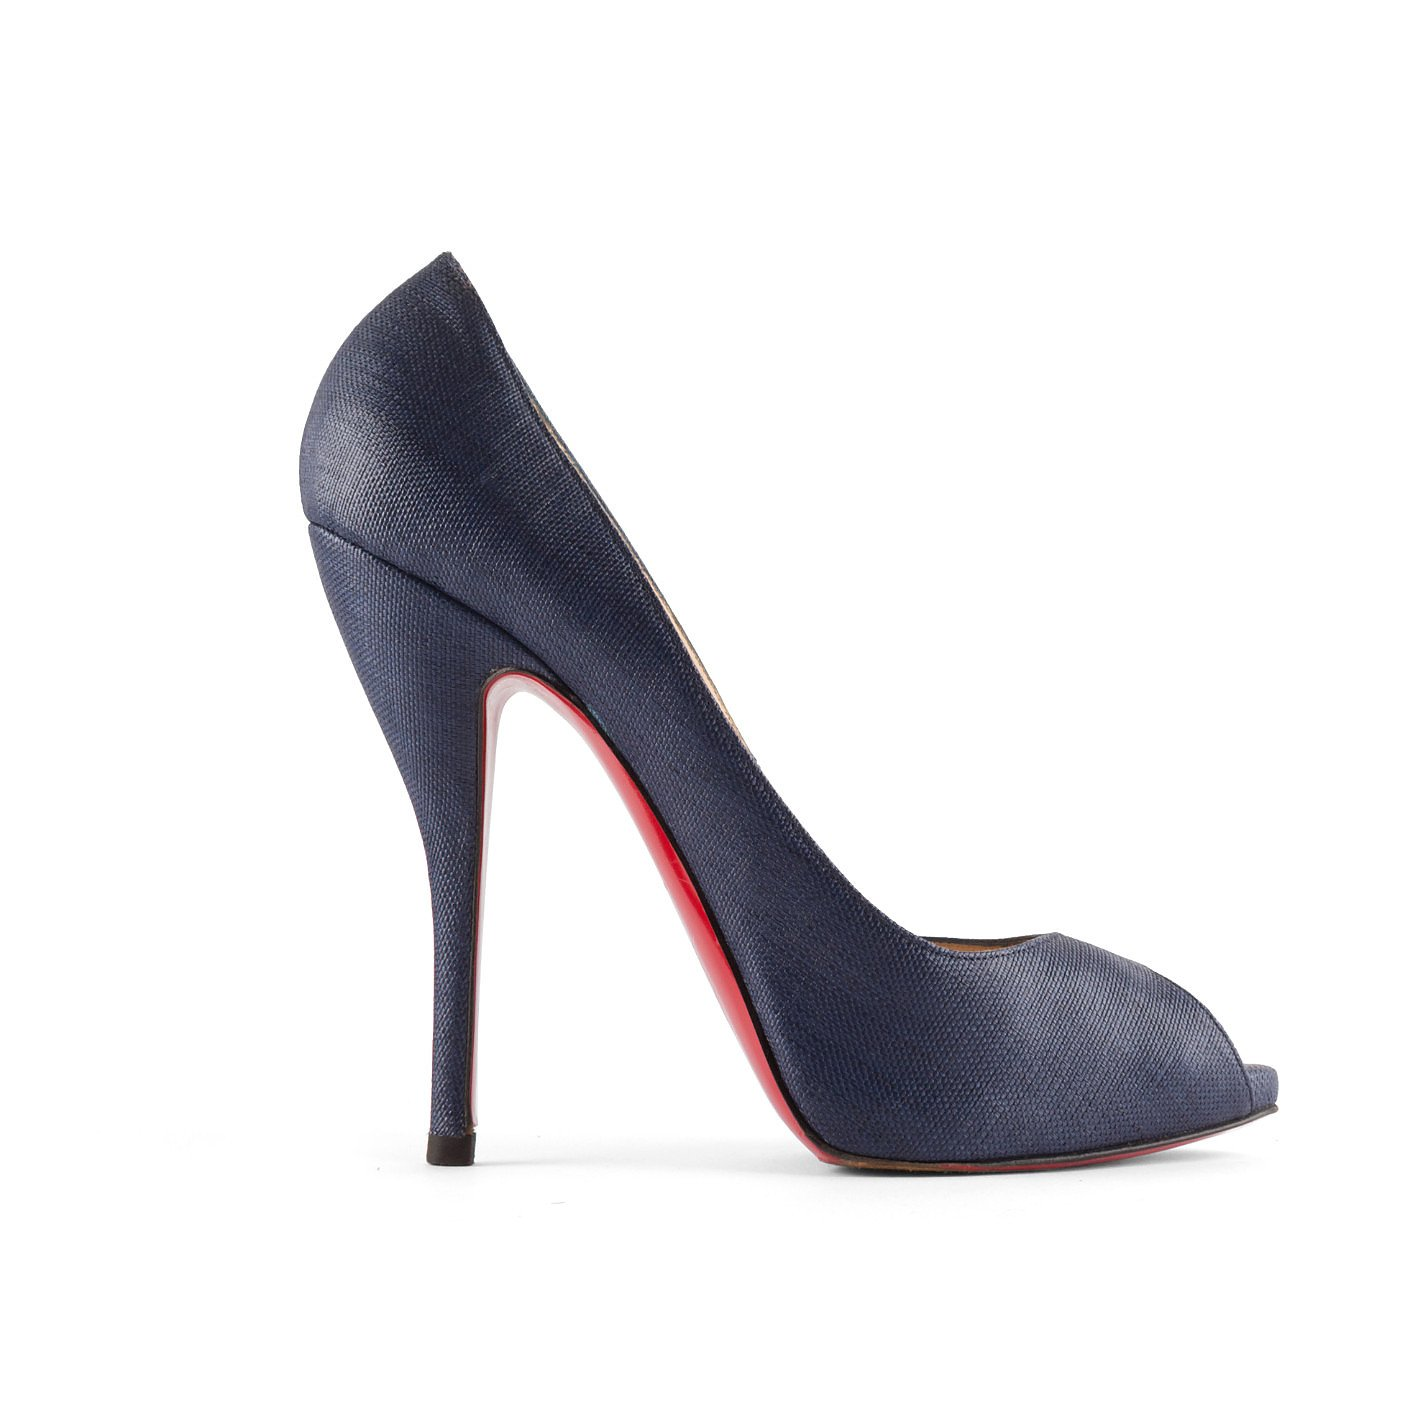 Christian Louboutin Very Prive Peep Toe Heels